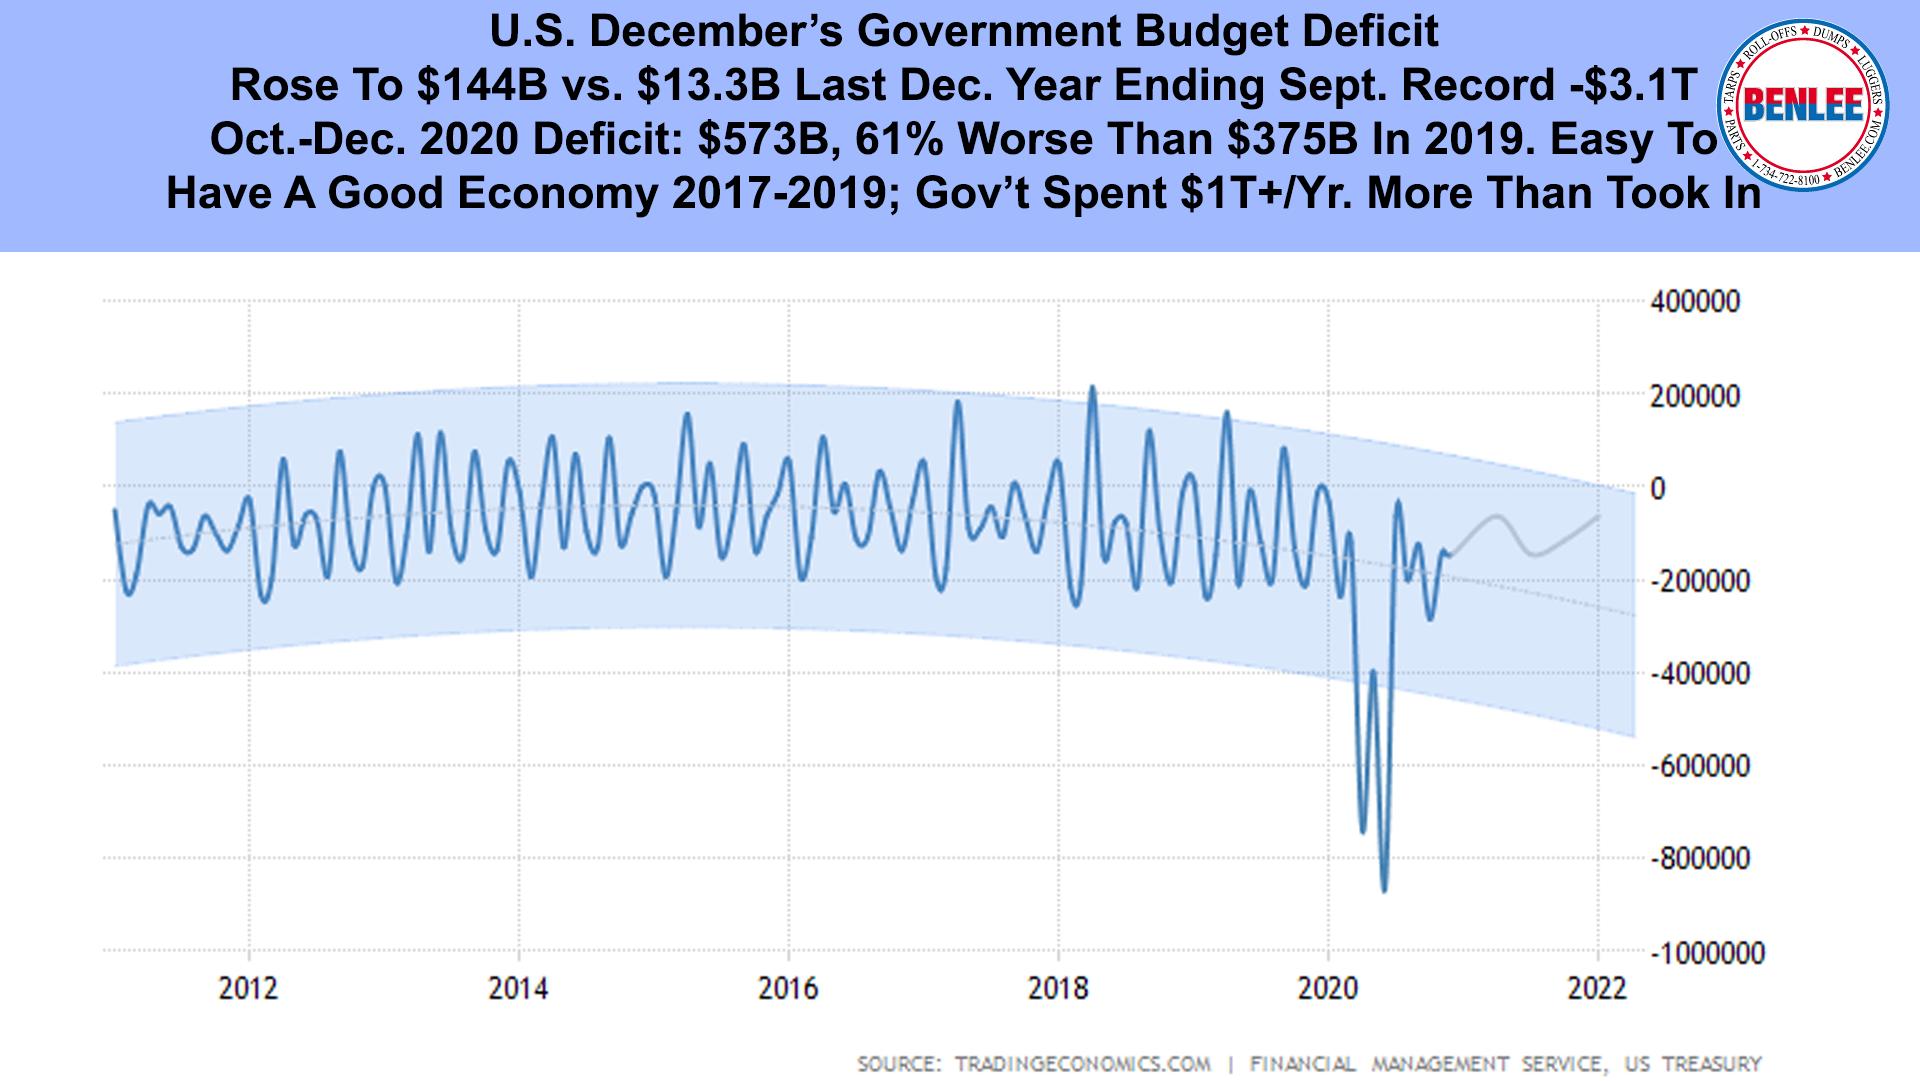 U.S. December's Government Budget Deficit